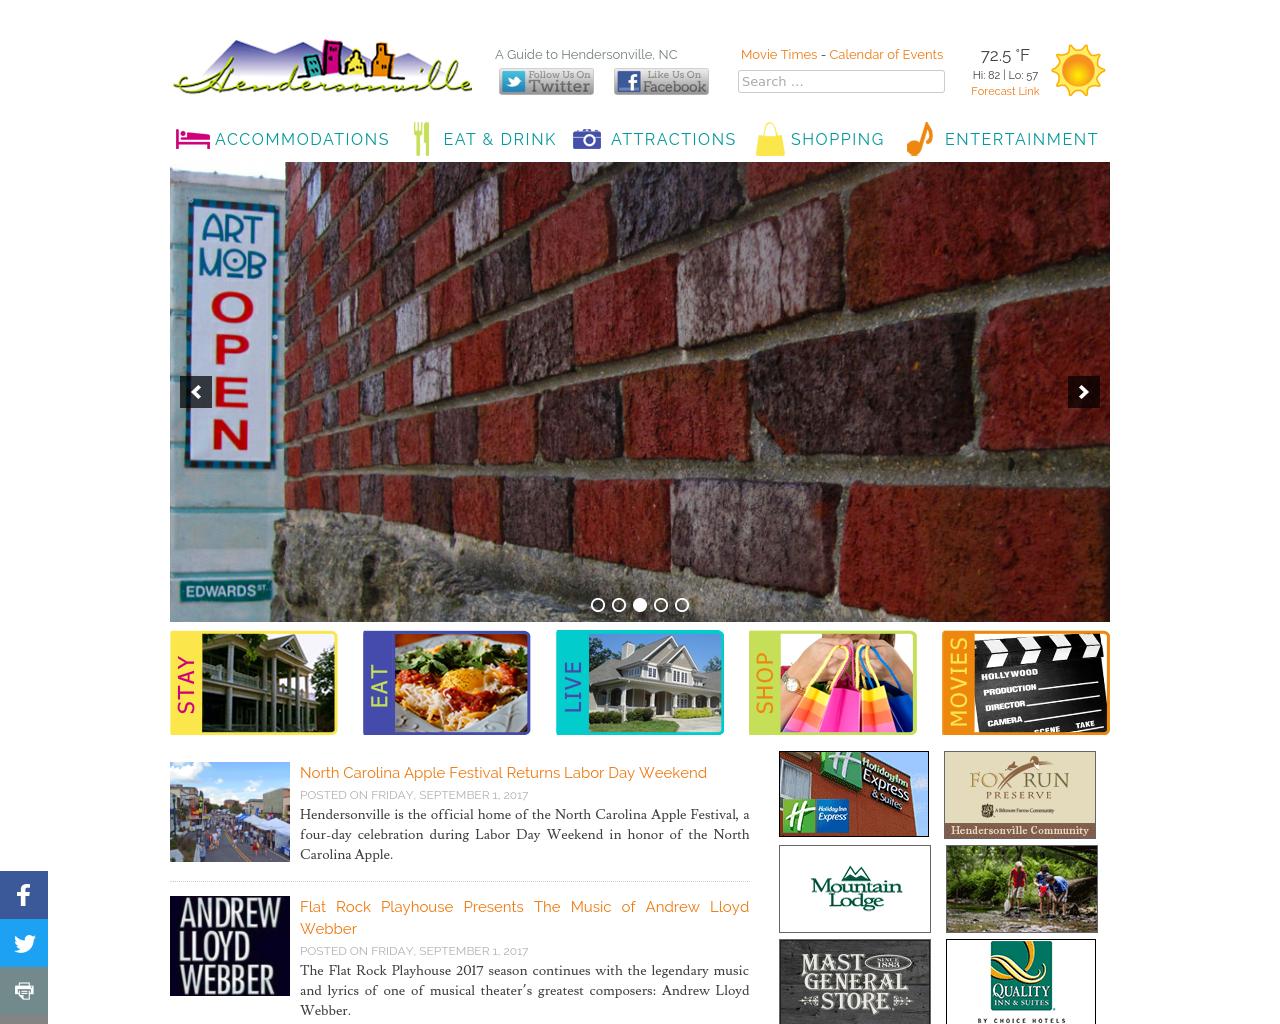 hendersonville.com-Advertising-Reviews-Pricing